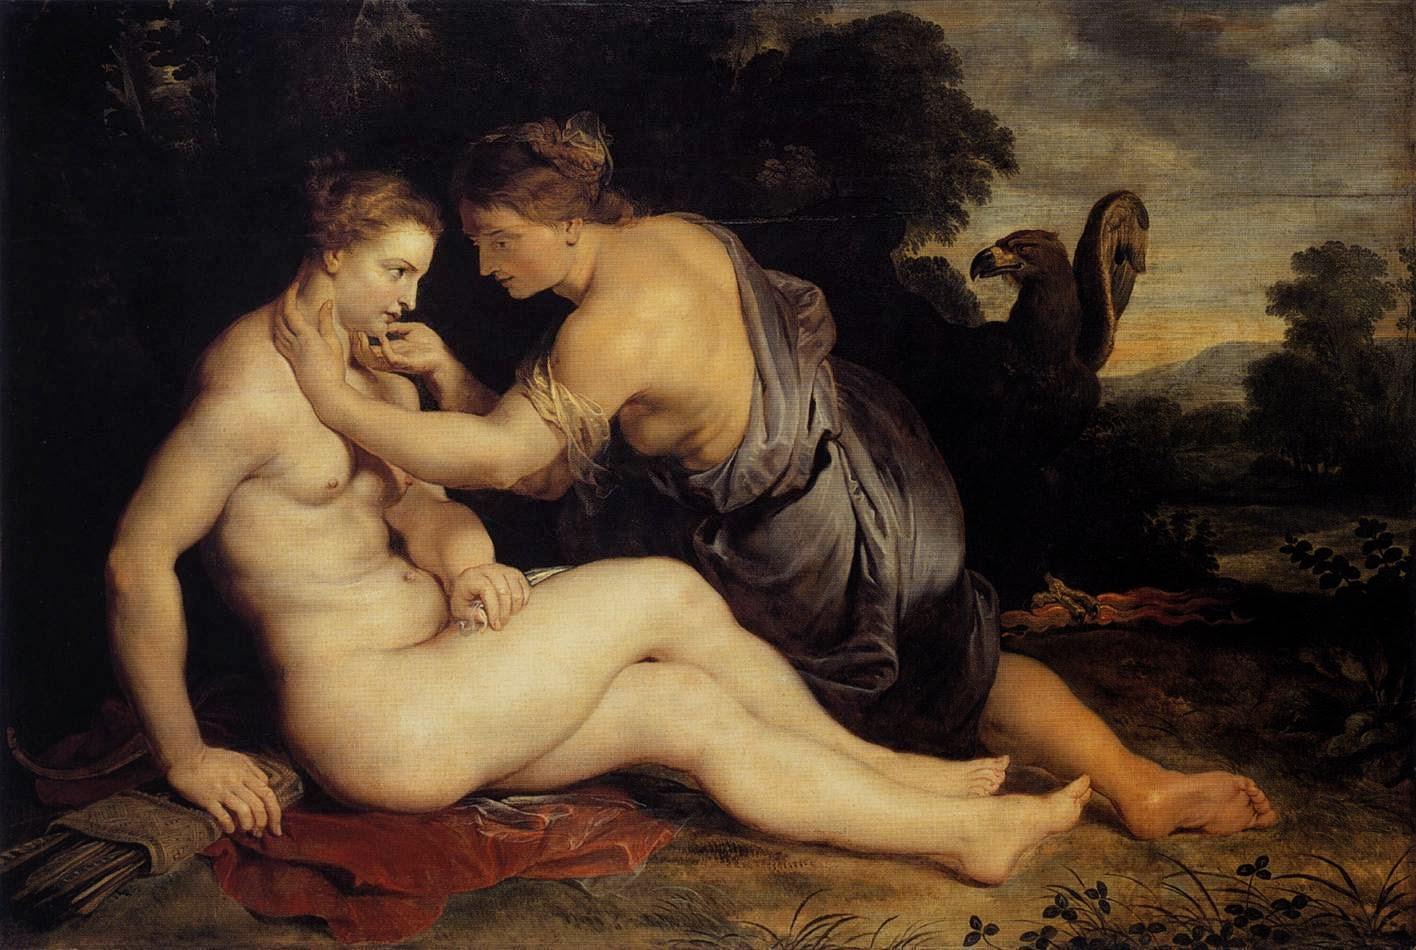 Jennifer goddess punished on principle alone Part 7